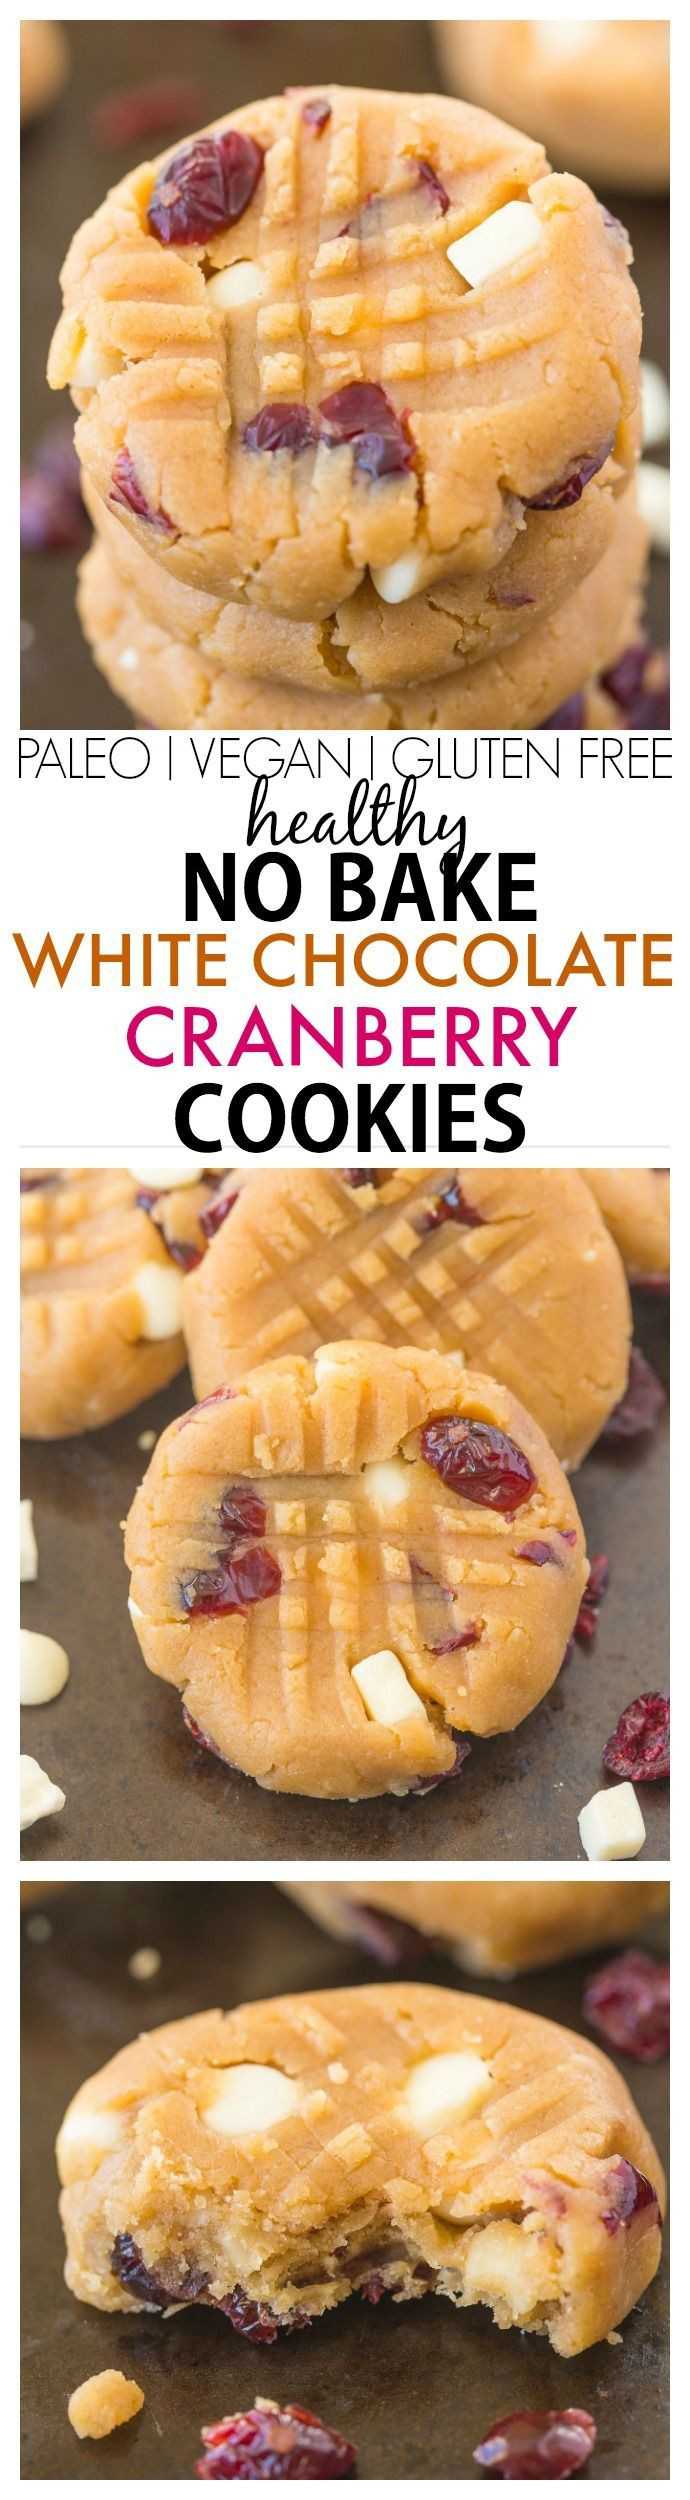 Healthy No Bake Cookies Sugar Free  Healthy No Bake White Chocolate Cranberry Cookies NO